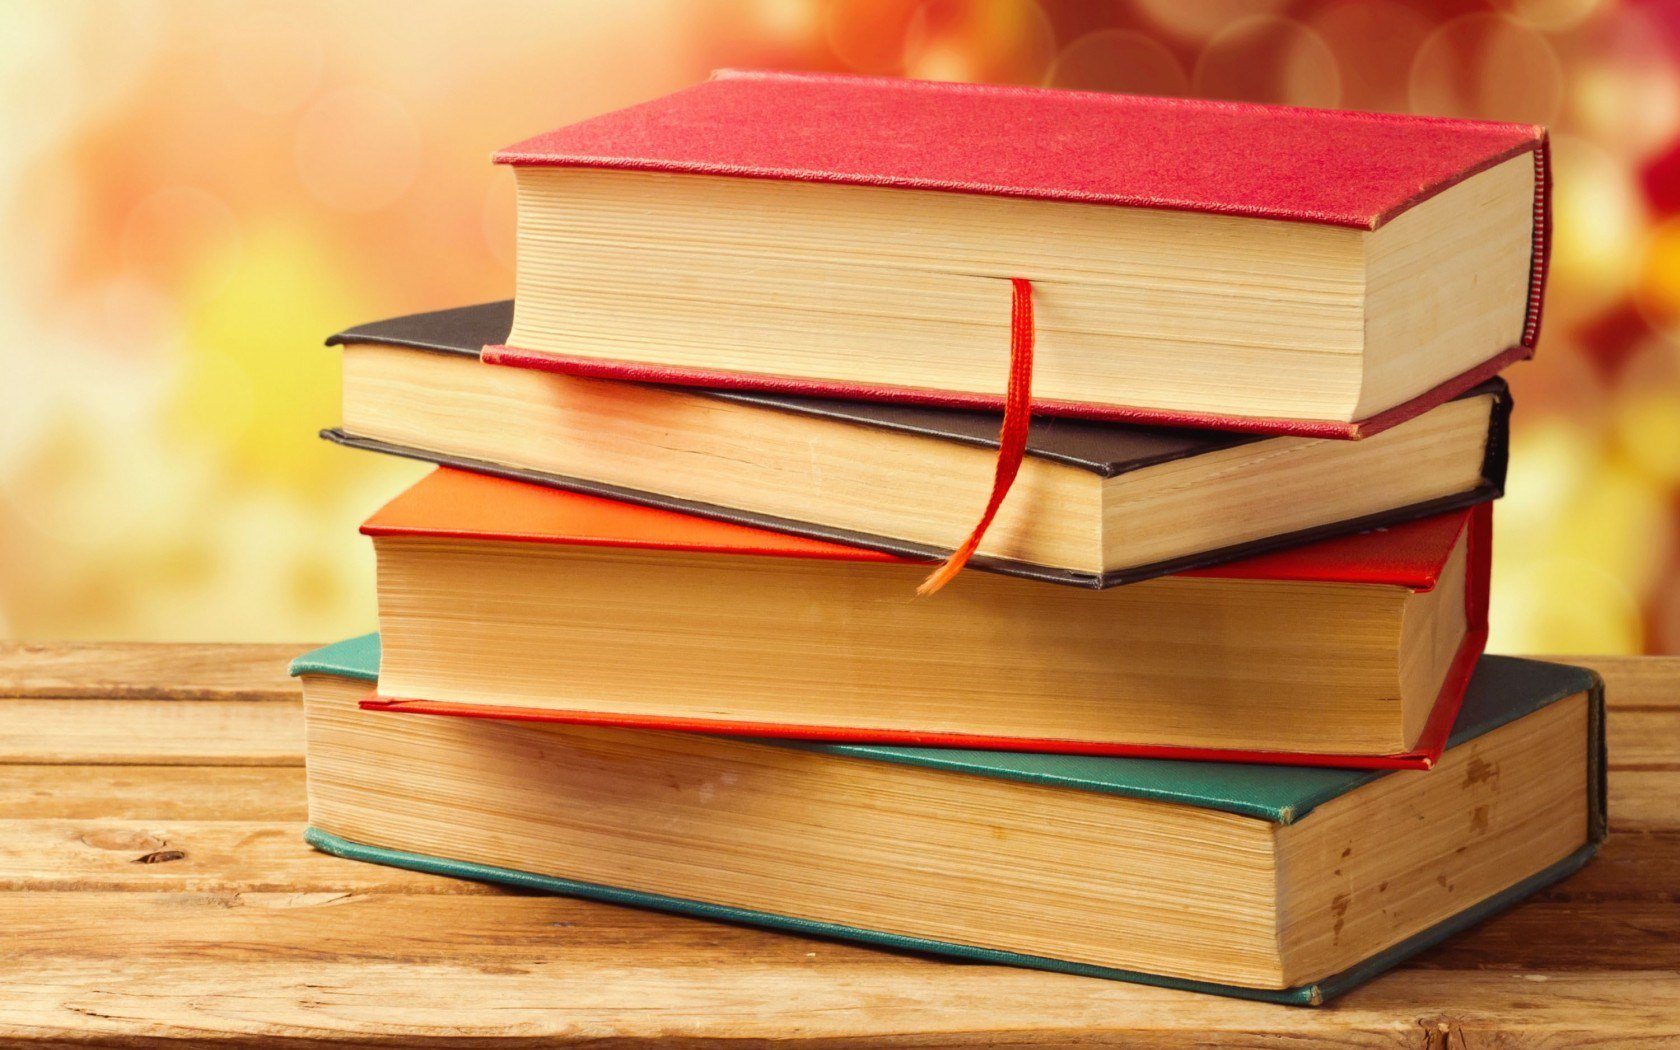 sindhi language authority announces best authors in eight genres